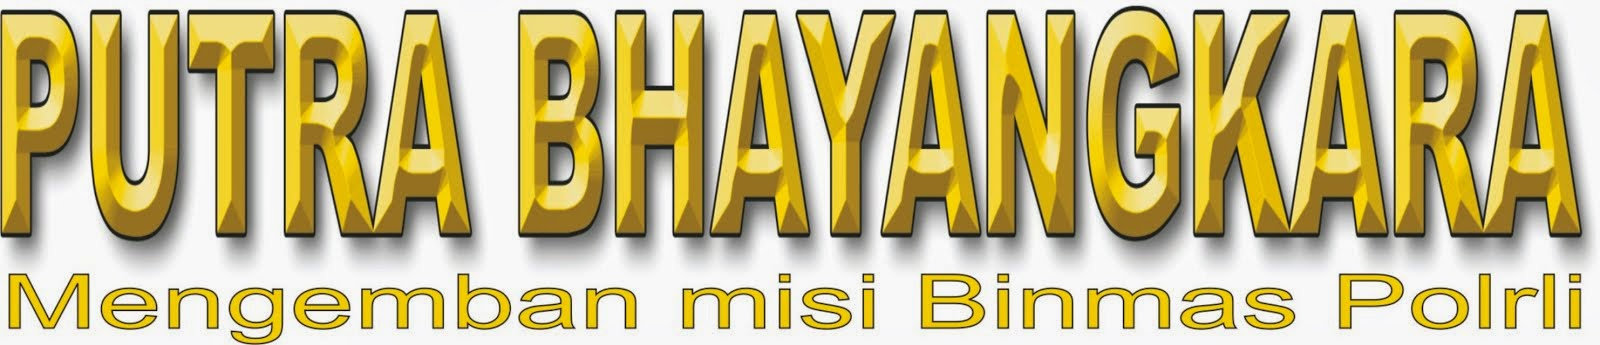 Putra Bhayangkara